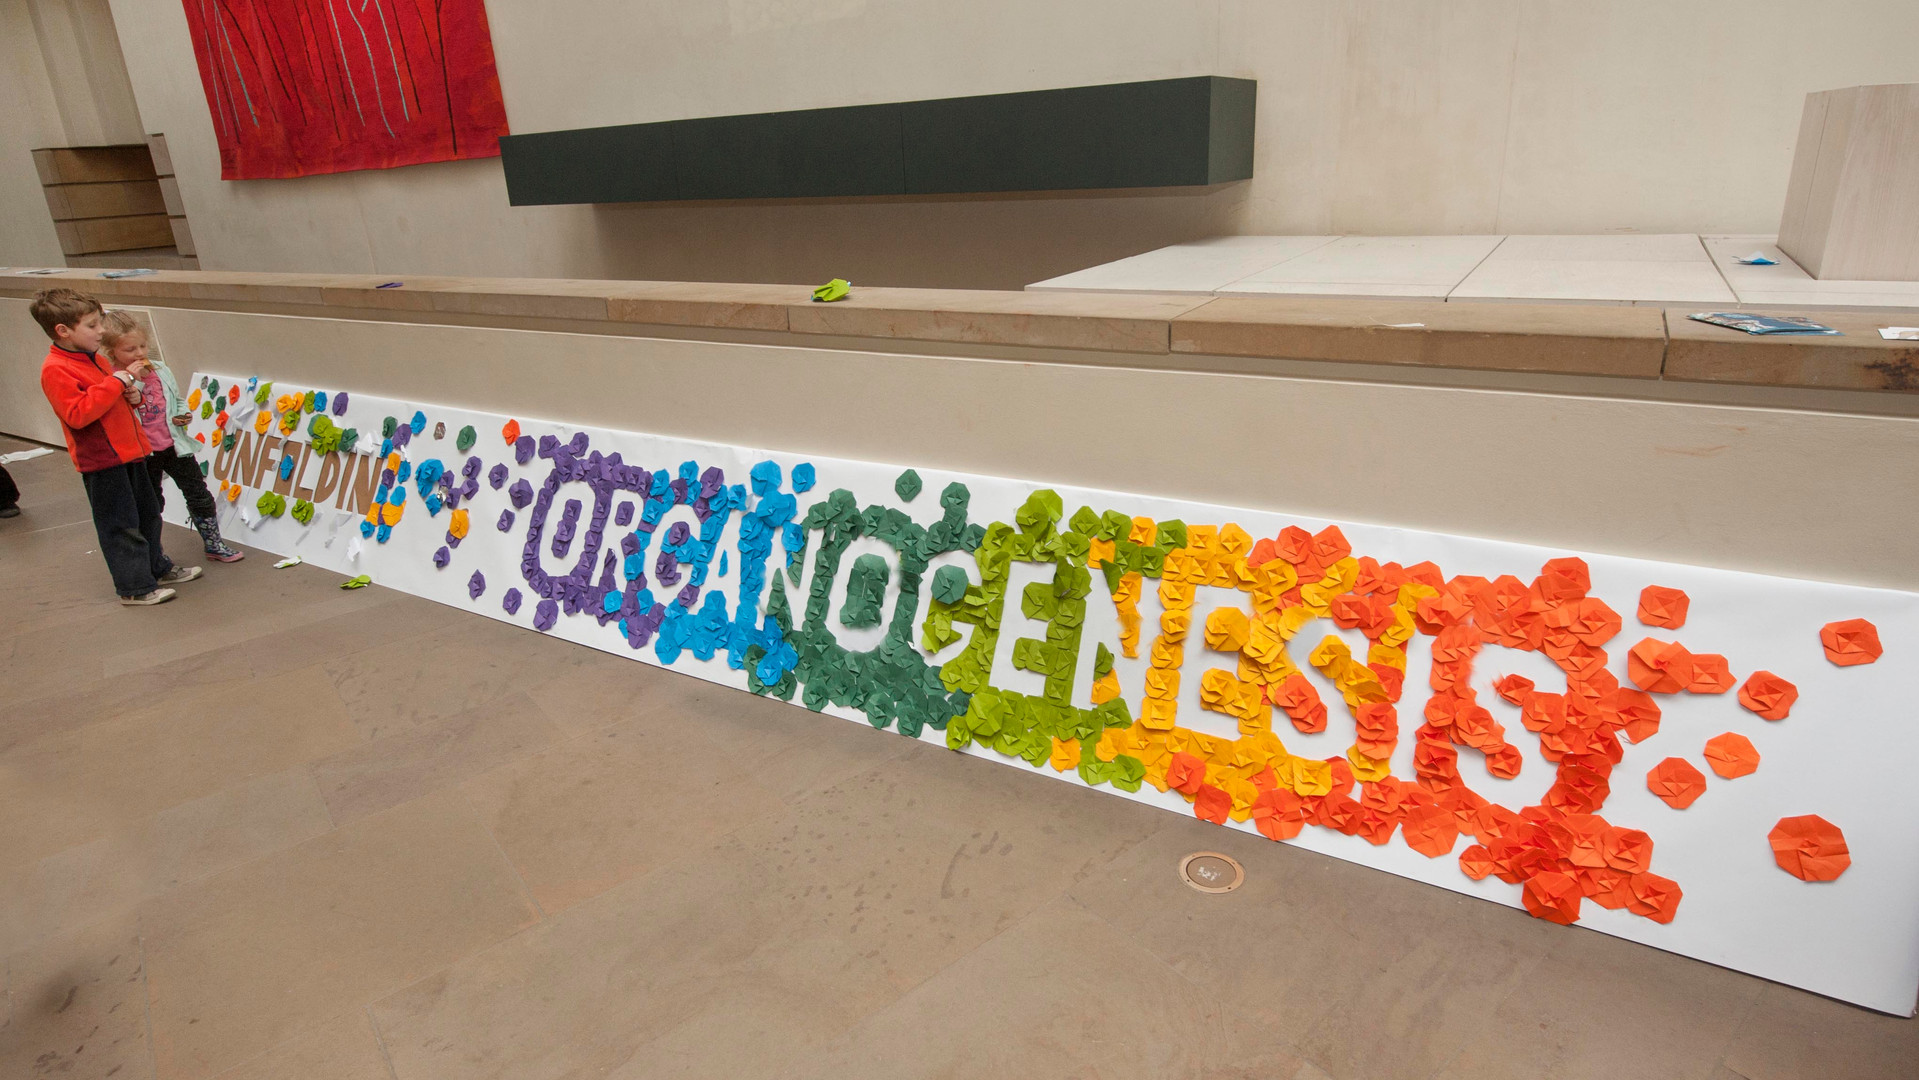 Unfolding organo-genesis